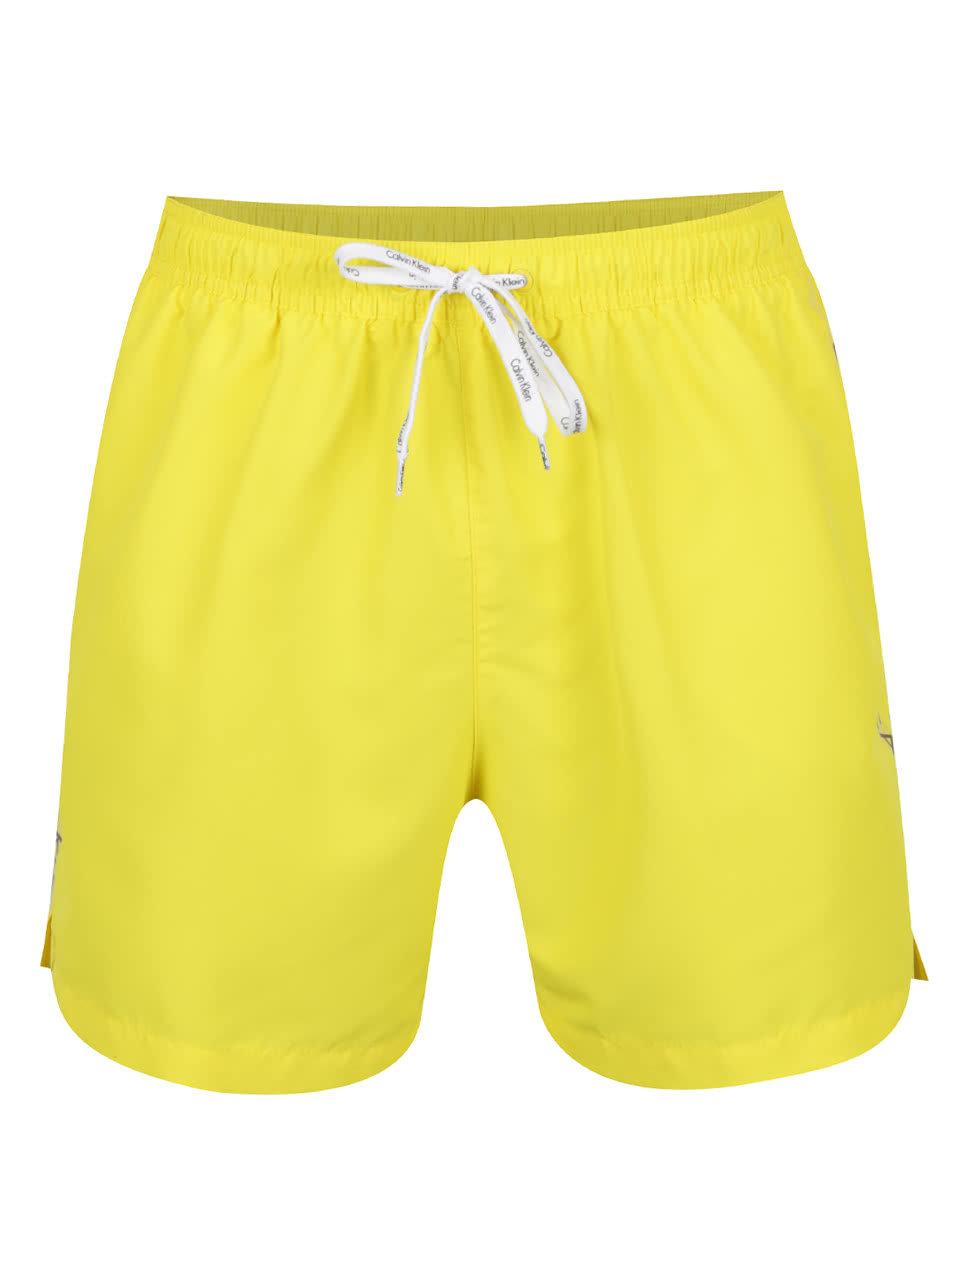 83a34e051 Pánske žlté plavky Calvin Klein | ZOOT.sk